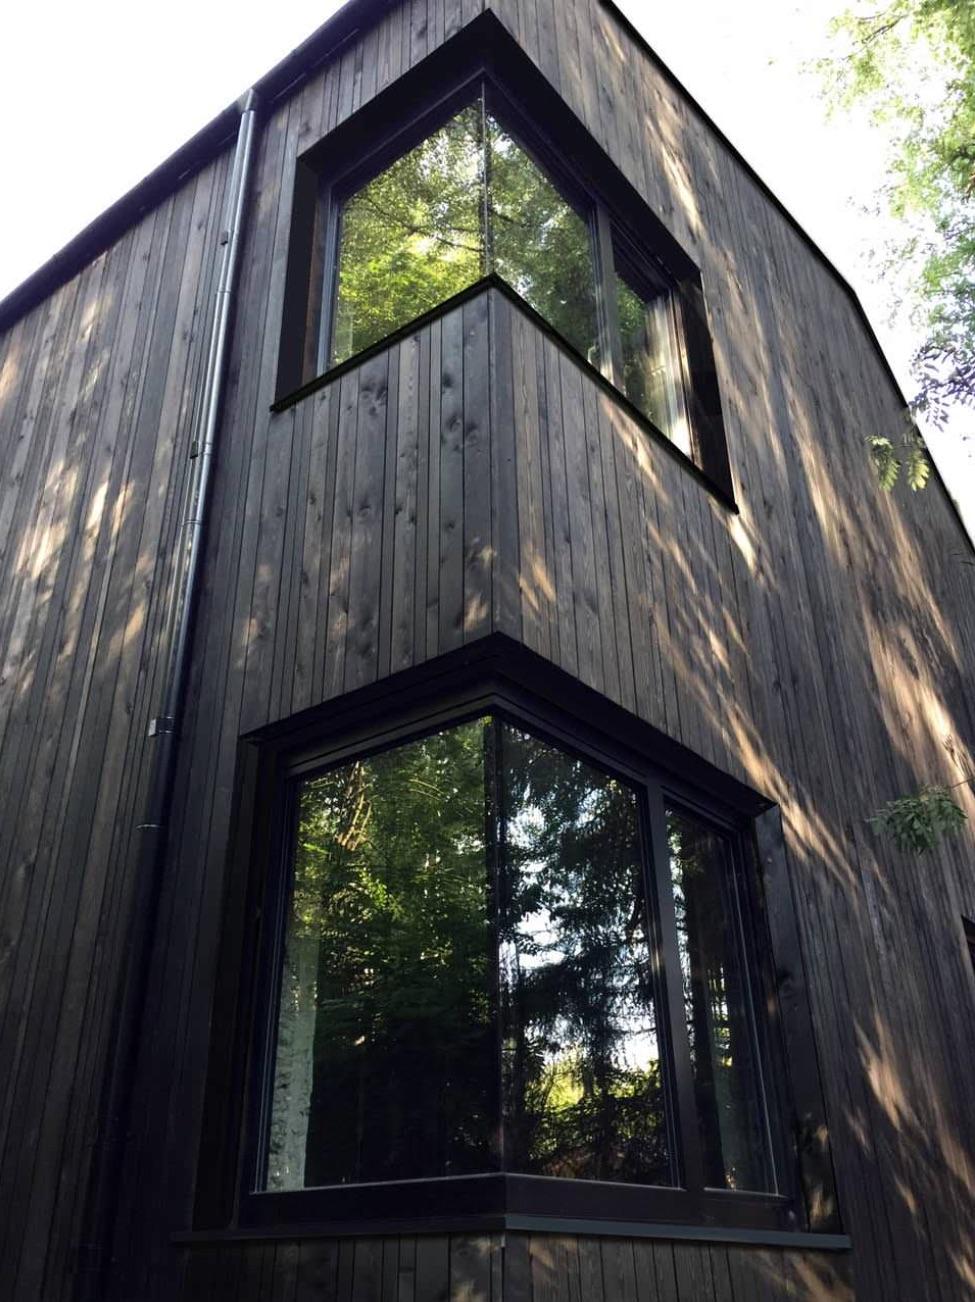 A modern house with dark wood siding and black window frames.